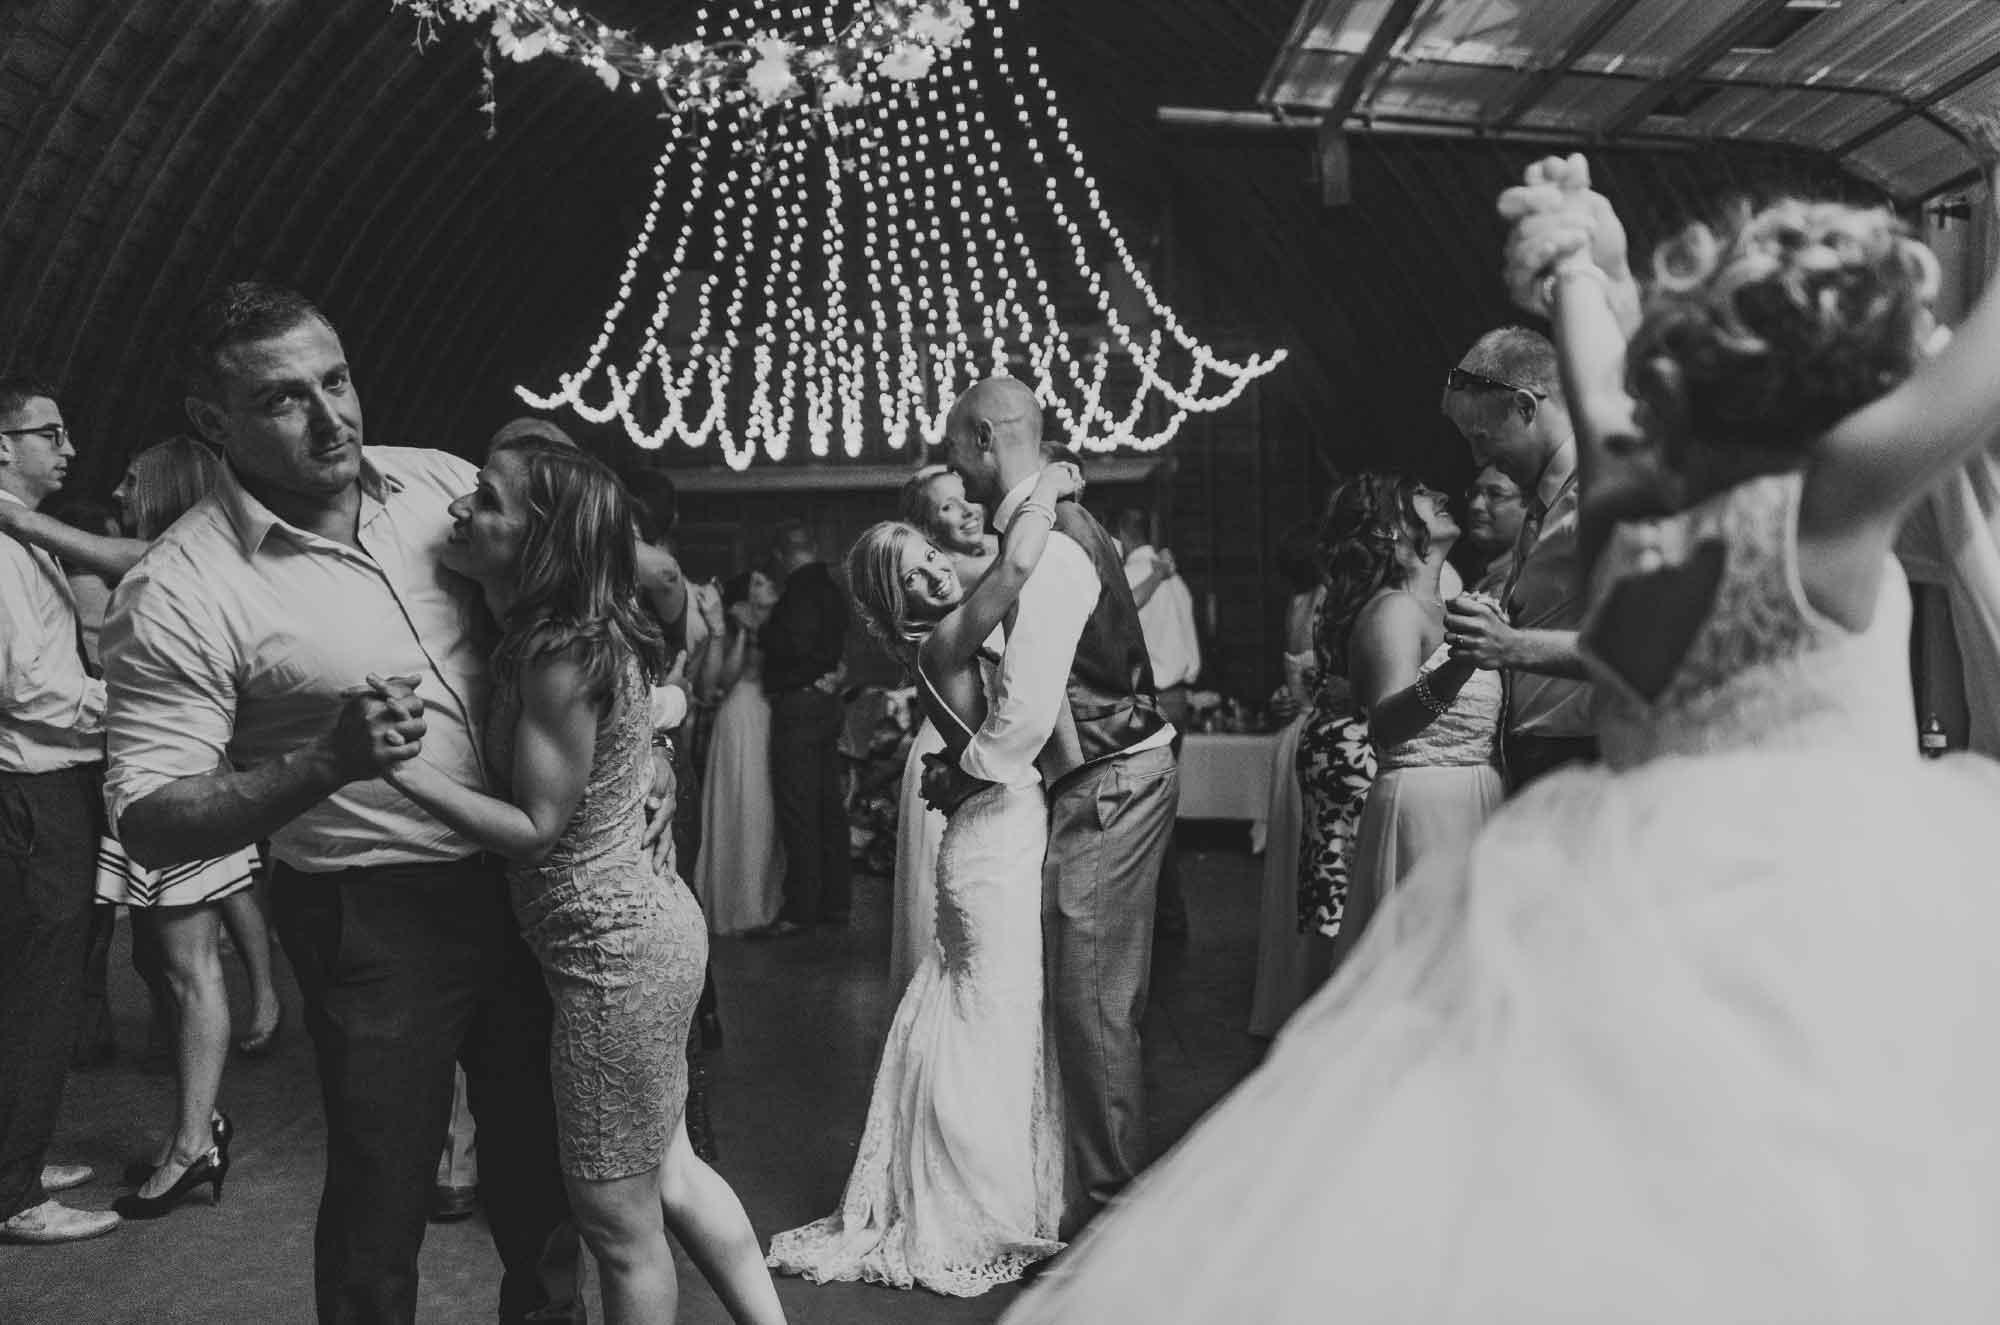 32-couple-dance-wedding-reception.jpg